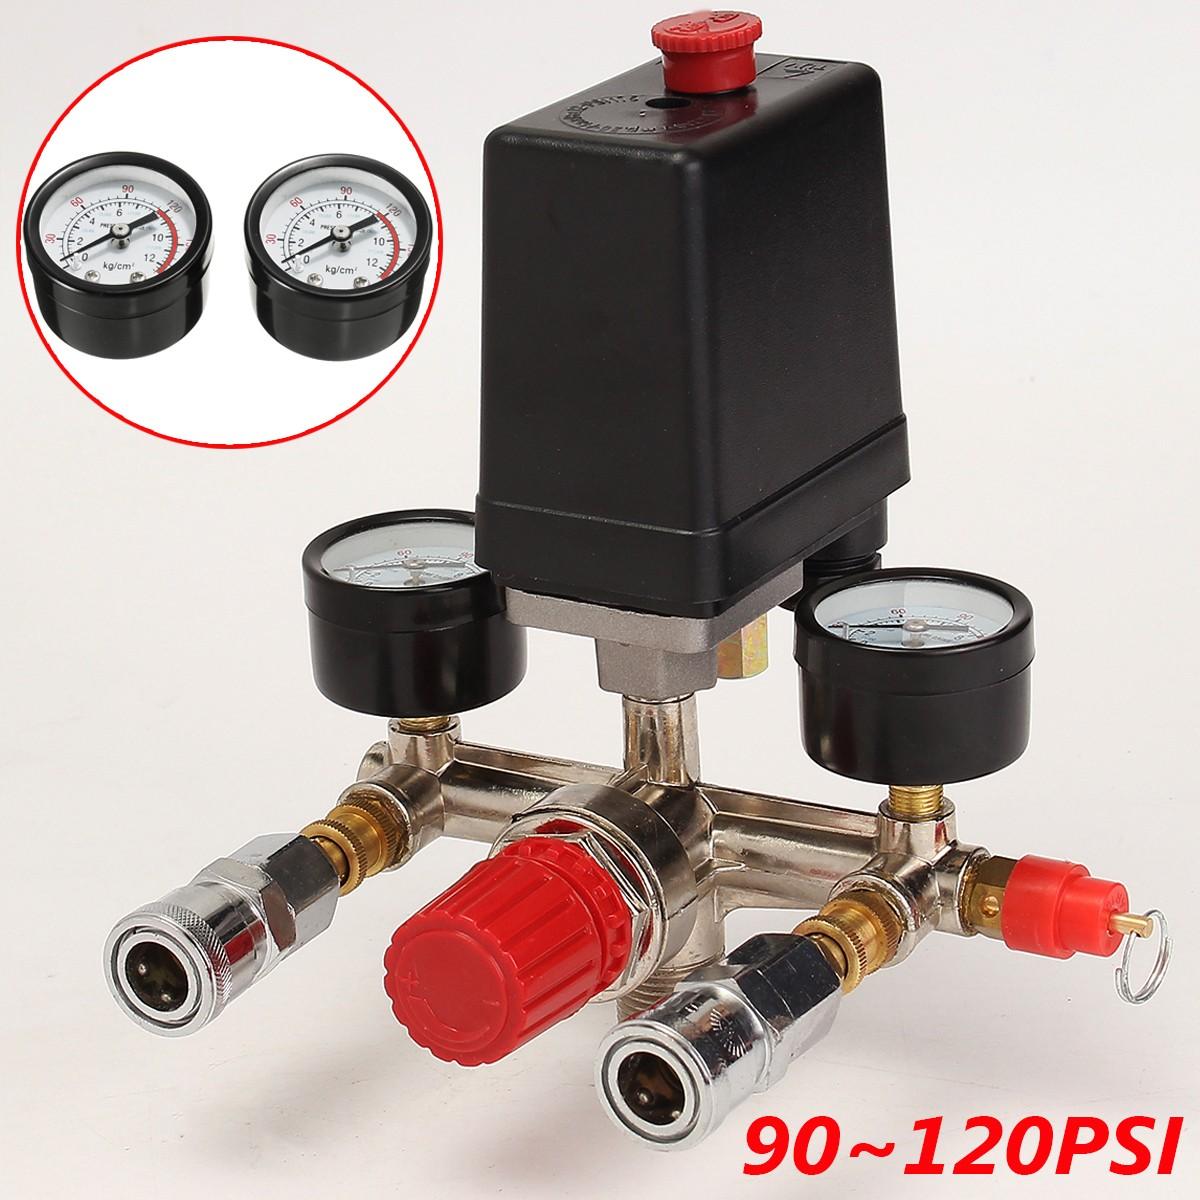 tempsa compresseur d 39 air pressostat pompe valve r gulation pression contr le jauge achat. Black Bedroom Furniture Sets. Home Design Ideas